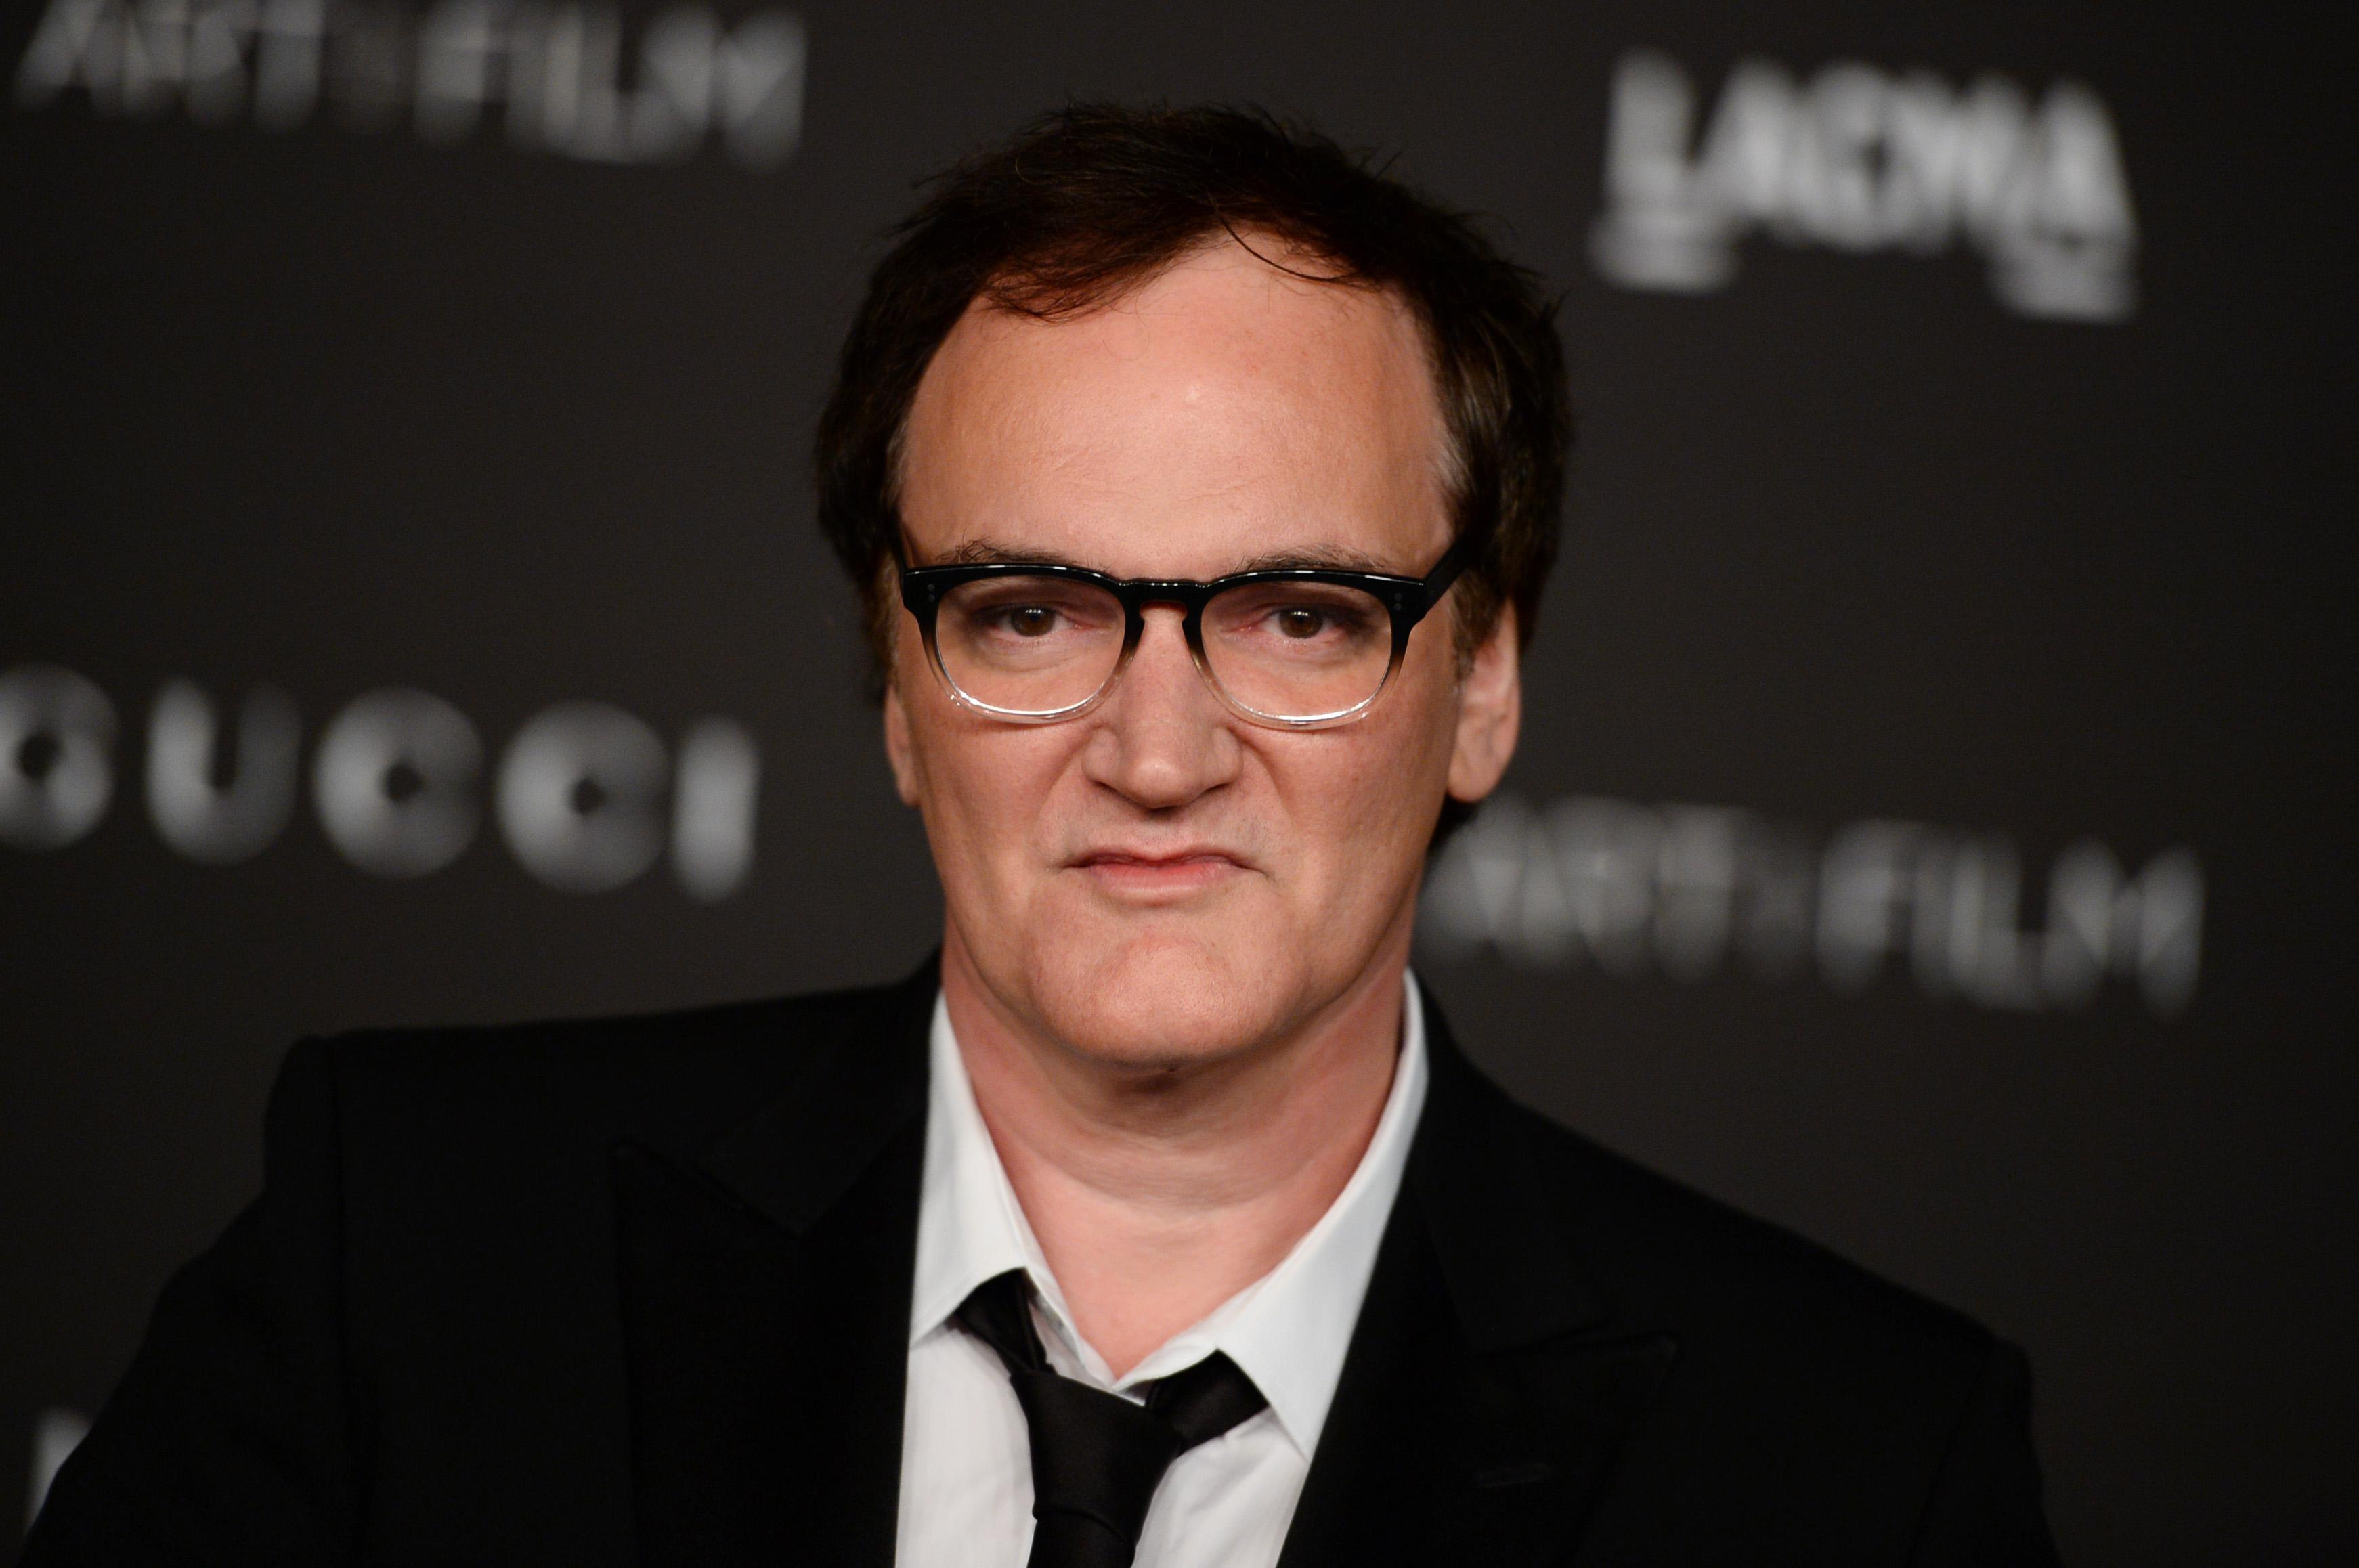 Quentin Tarantino at the LACMA Art + Film Gala in Los Angeles on Nov. 1, 2014.